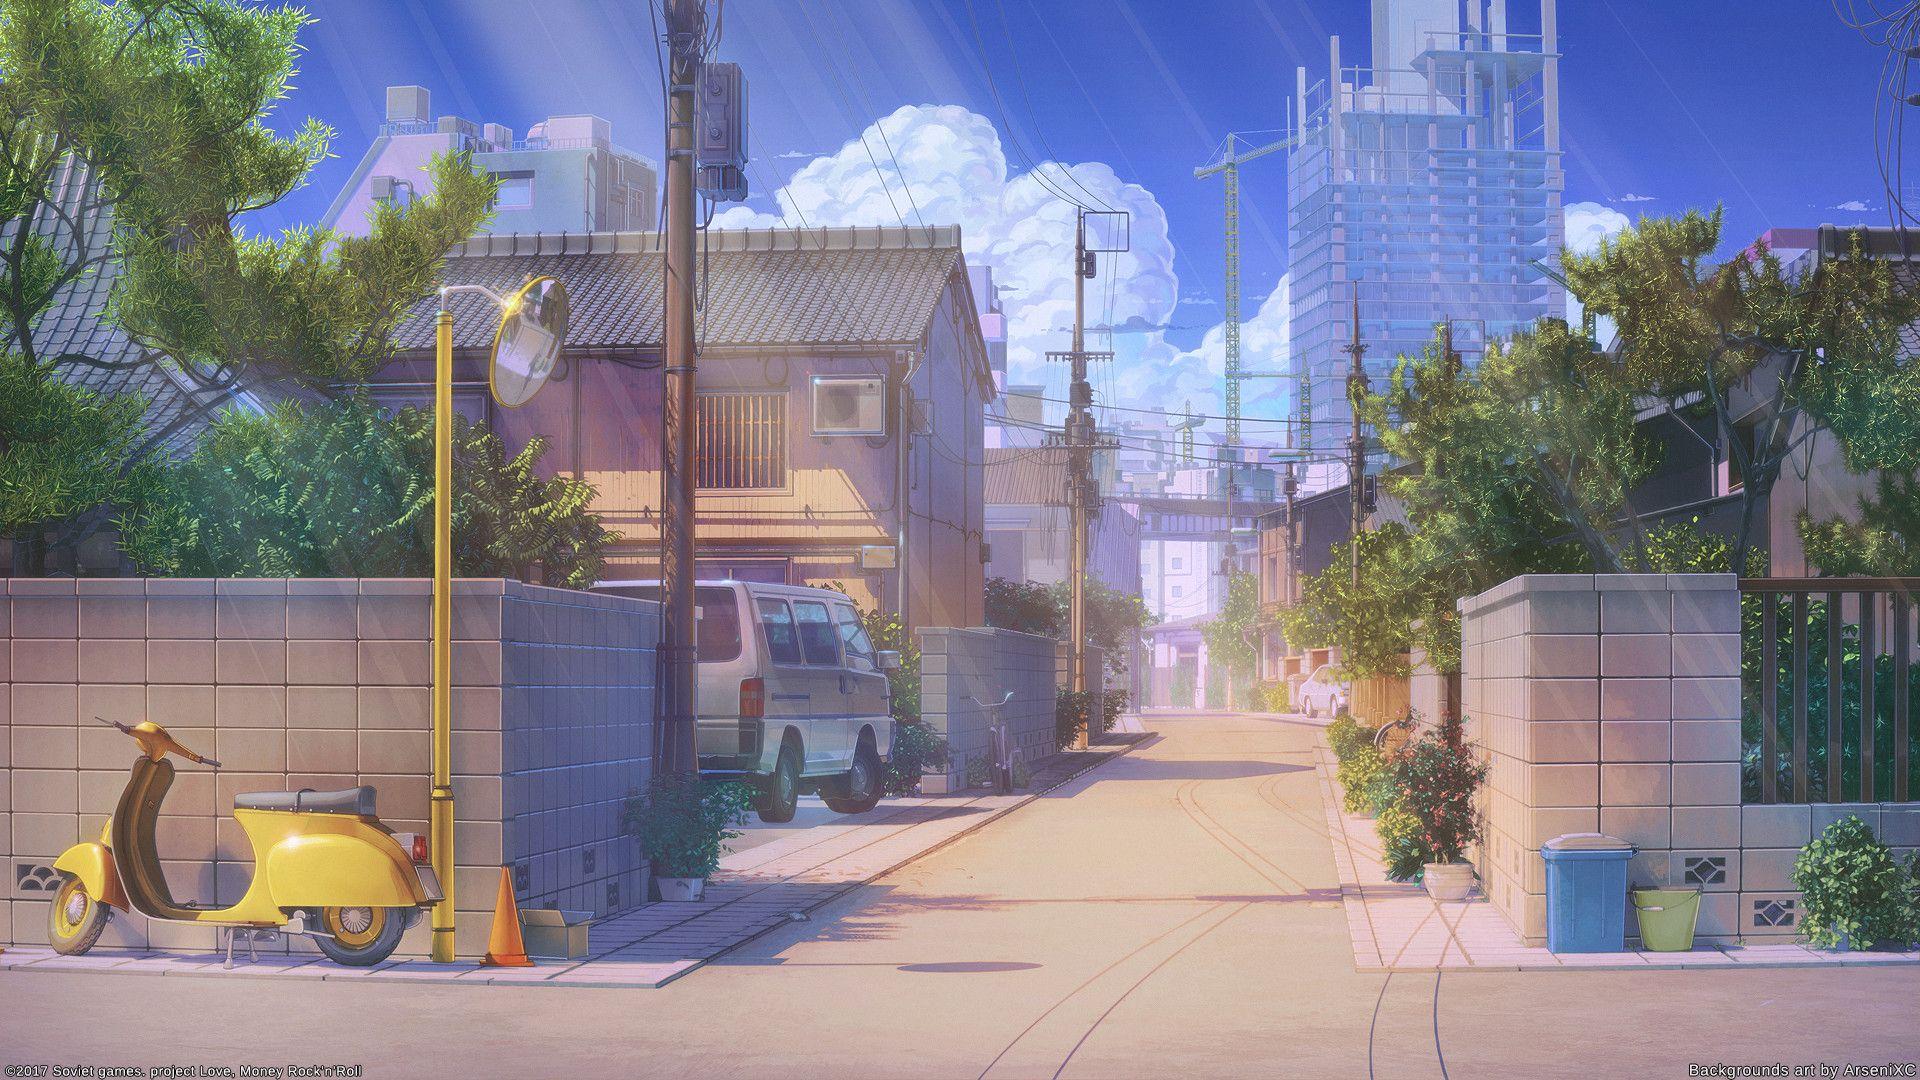 Japan Street By Arseniy Chebynkin 1920x1080 Scenery Background Japan Street Anime Scenery